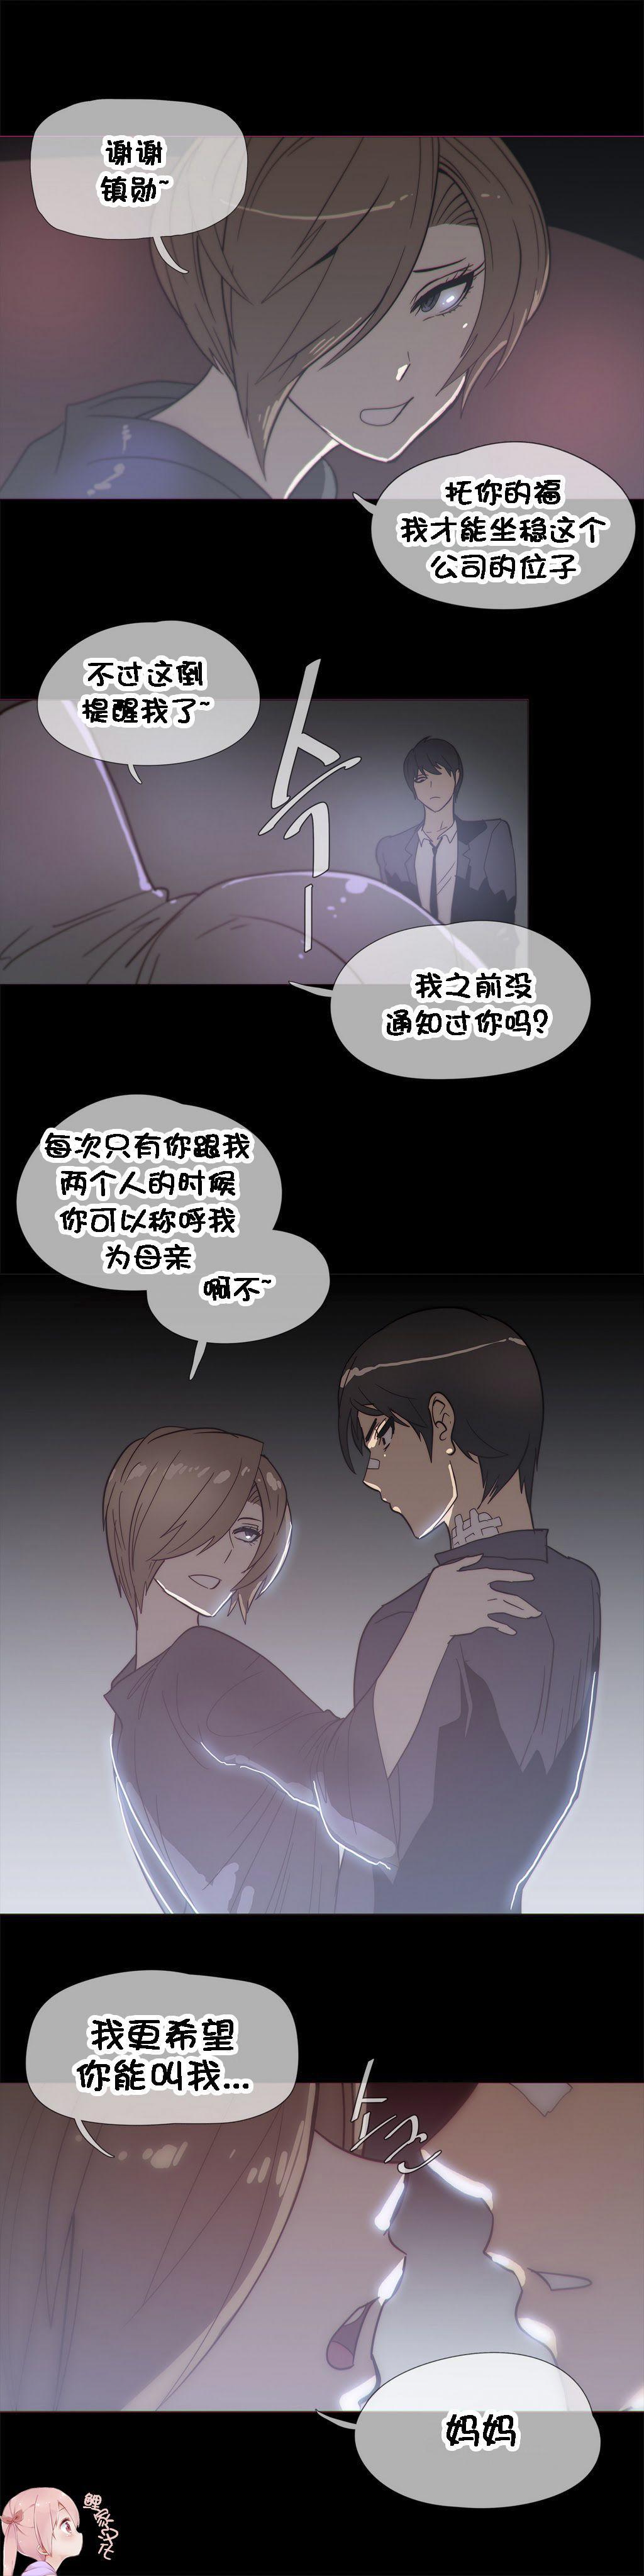 HouseHold Affairs 【卞赤鲤个人汉化】1~33话(持续更新中) 649